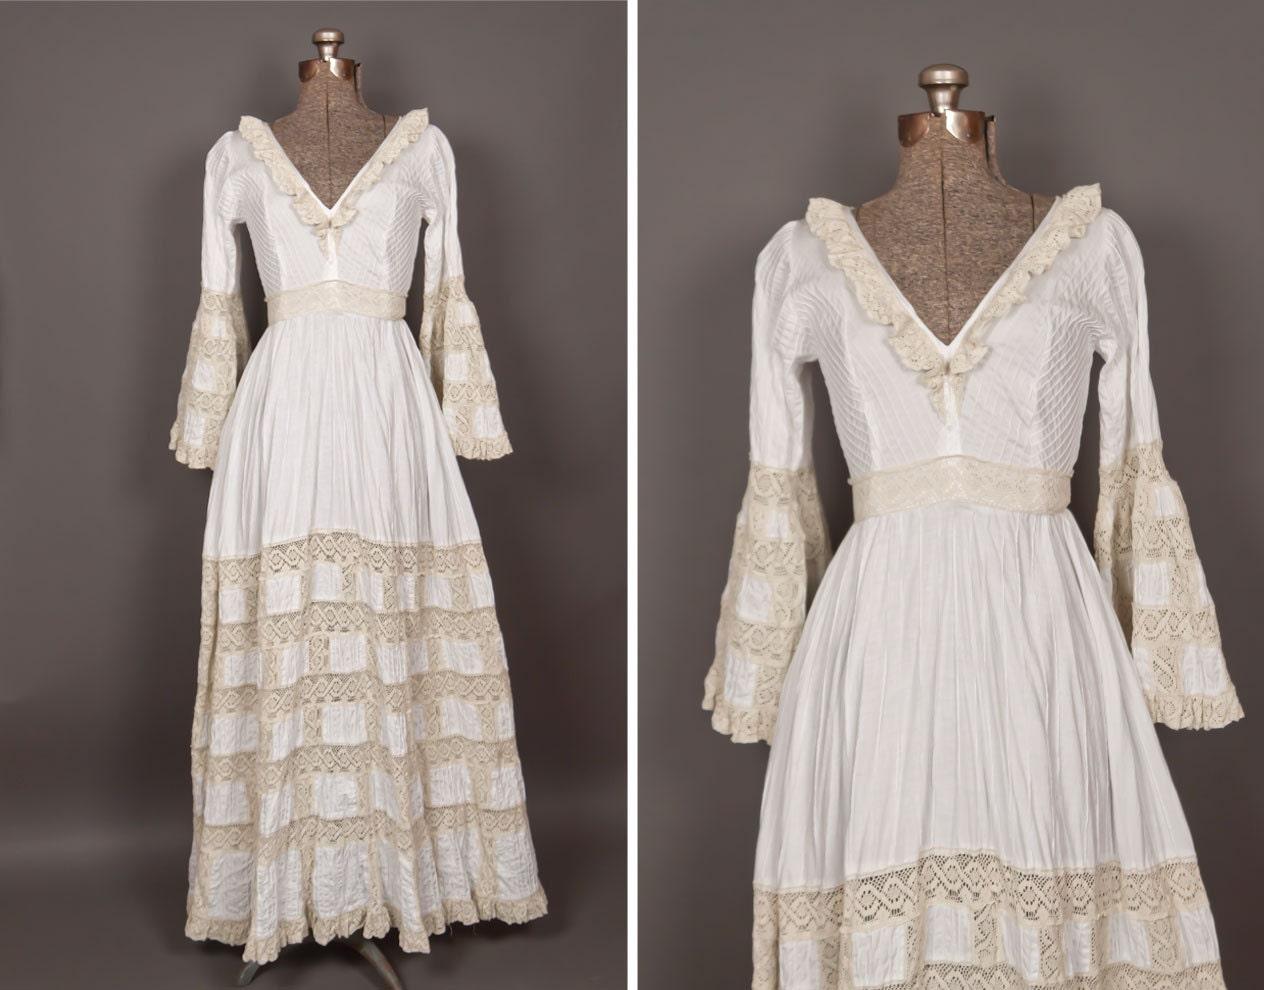 Mexican wedding dresses wedding dresses 2013 for Dresses for mexico wedding